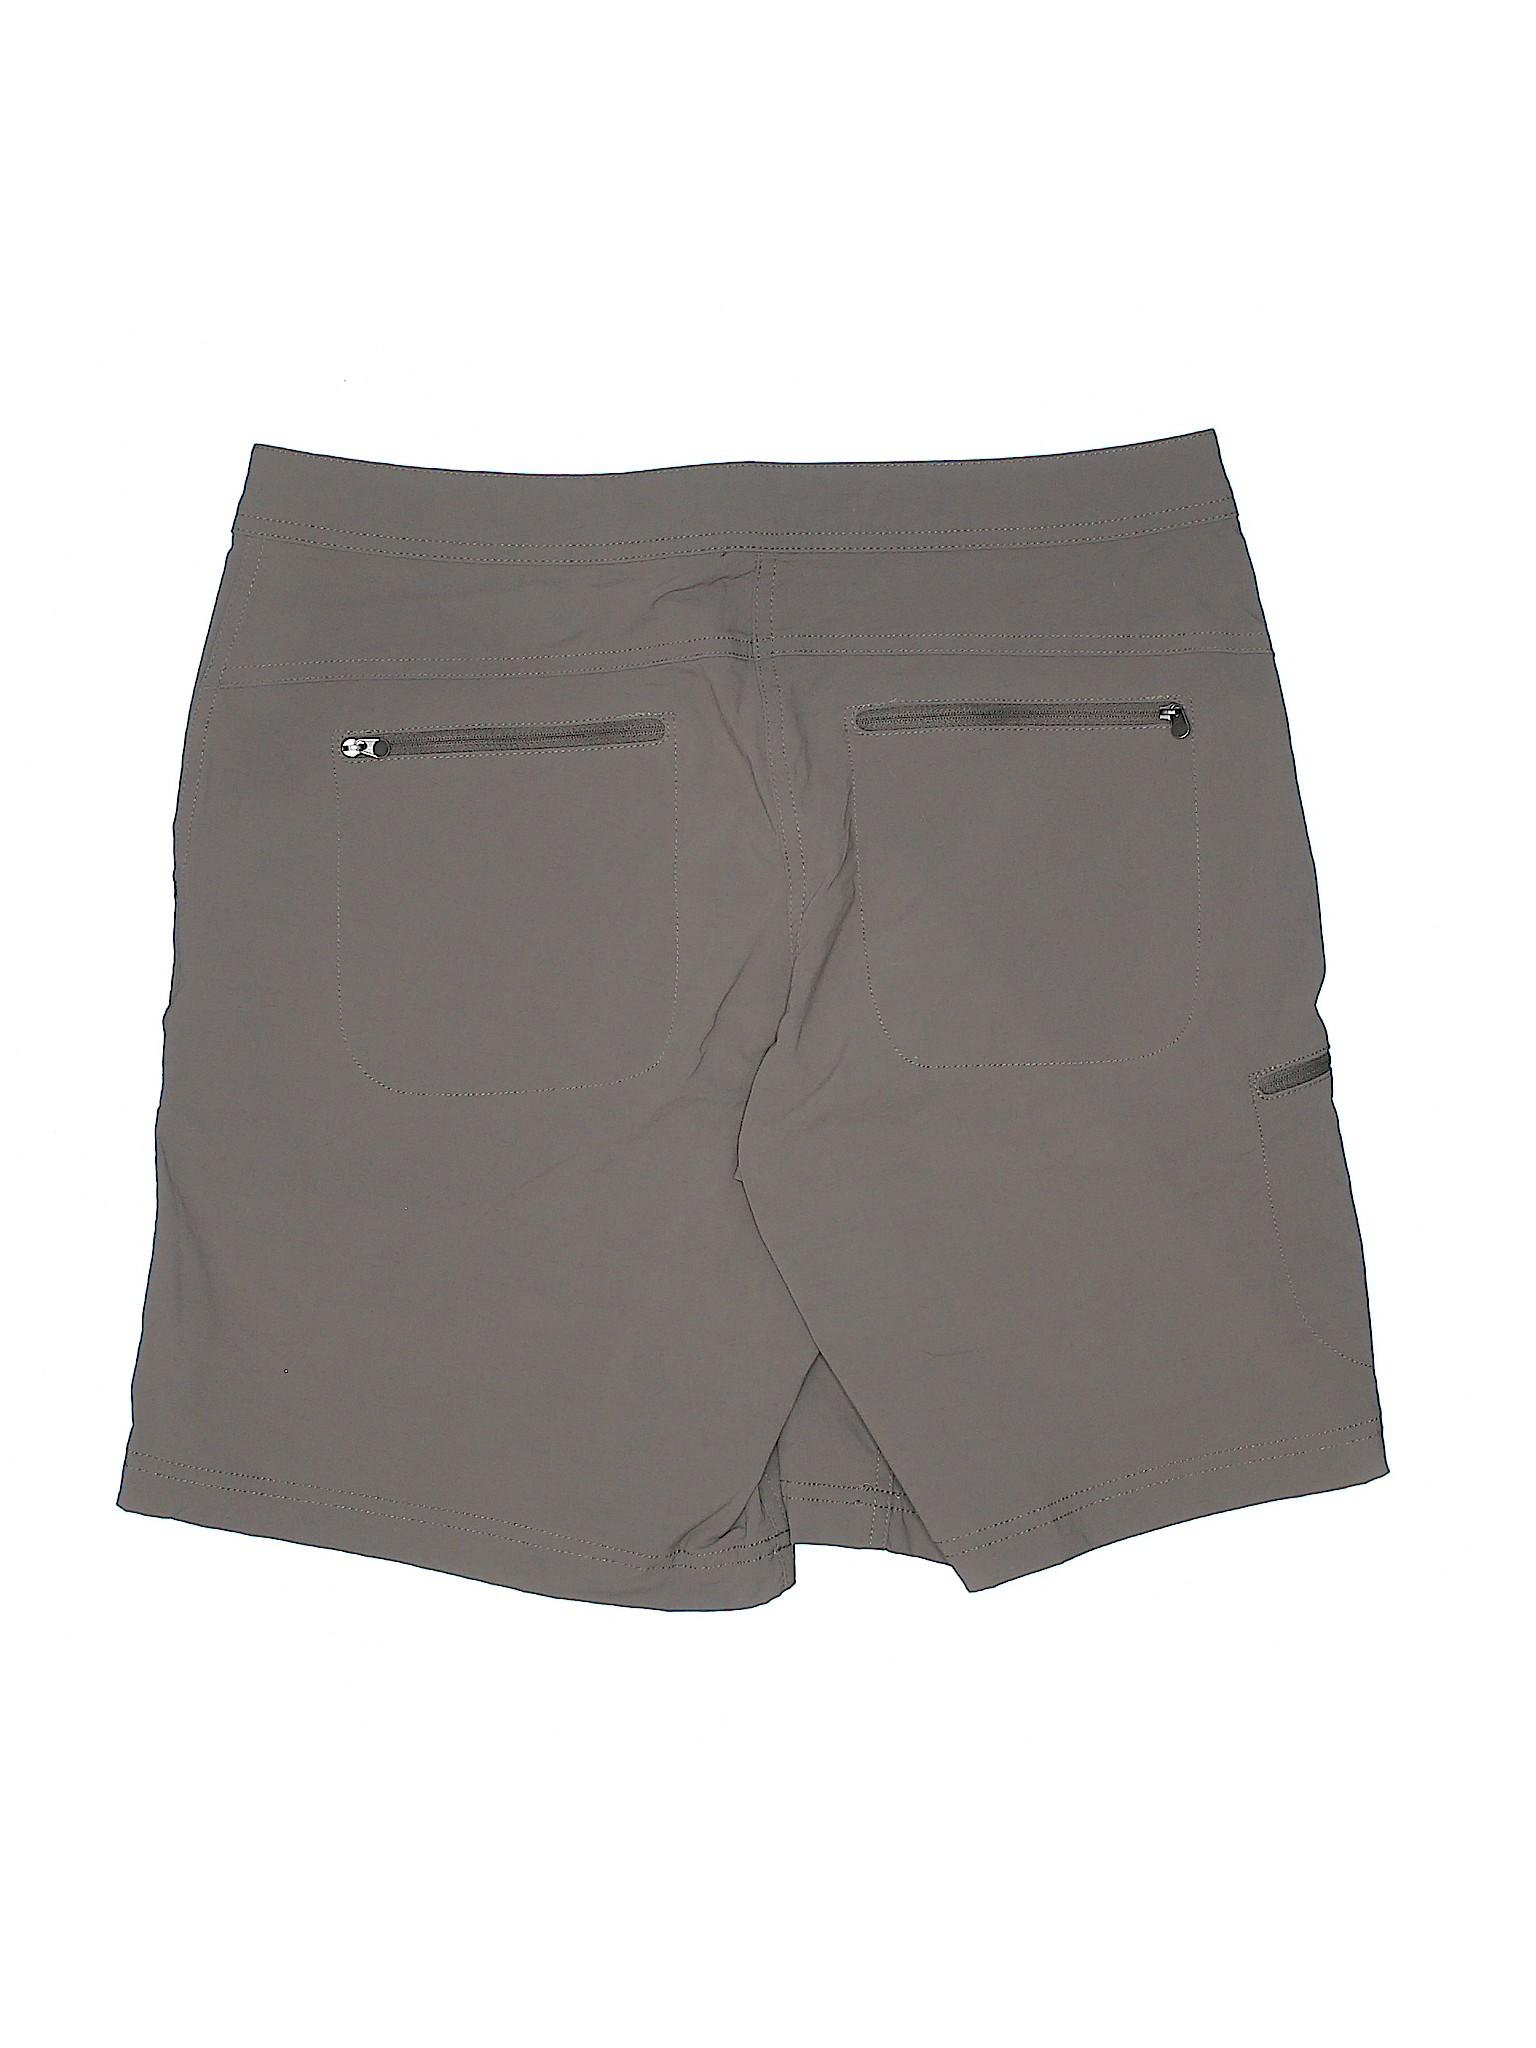 L Boutique Bean Khaki Shorts L qwPaCP7A